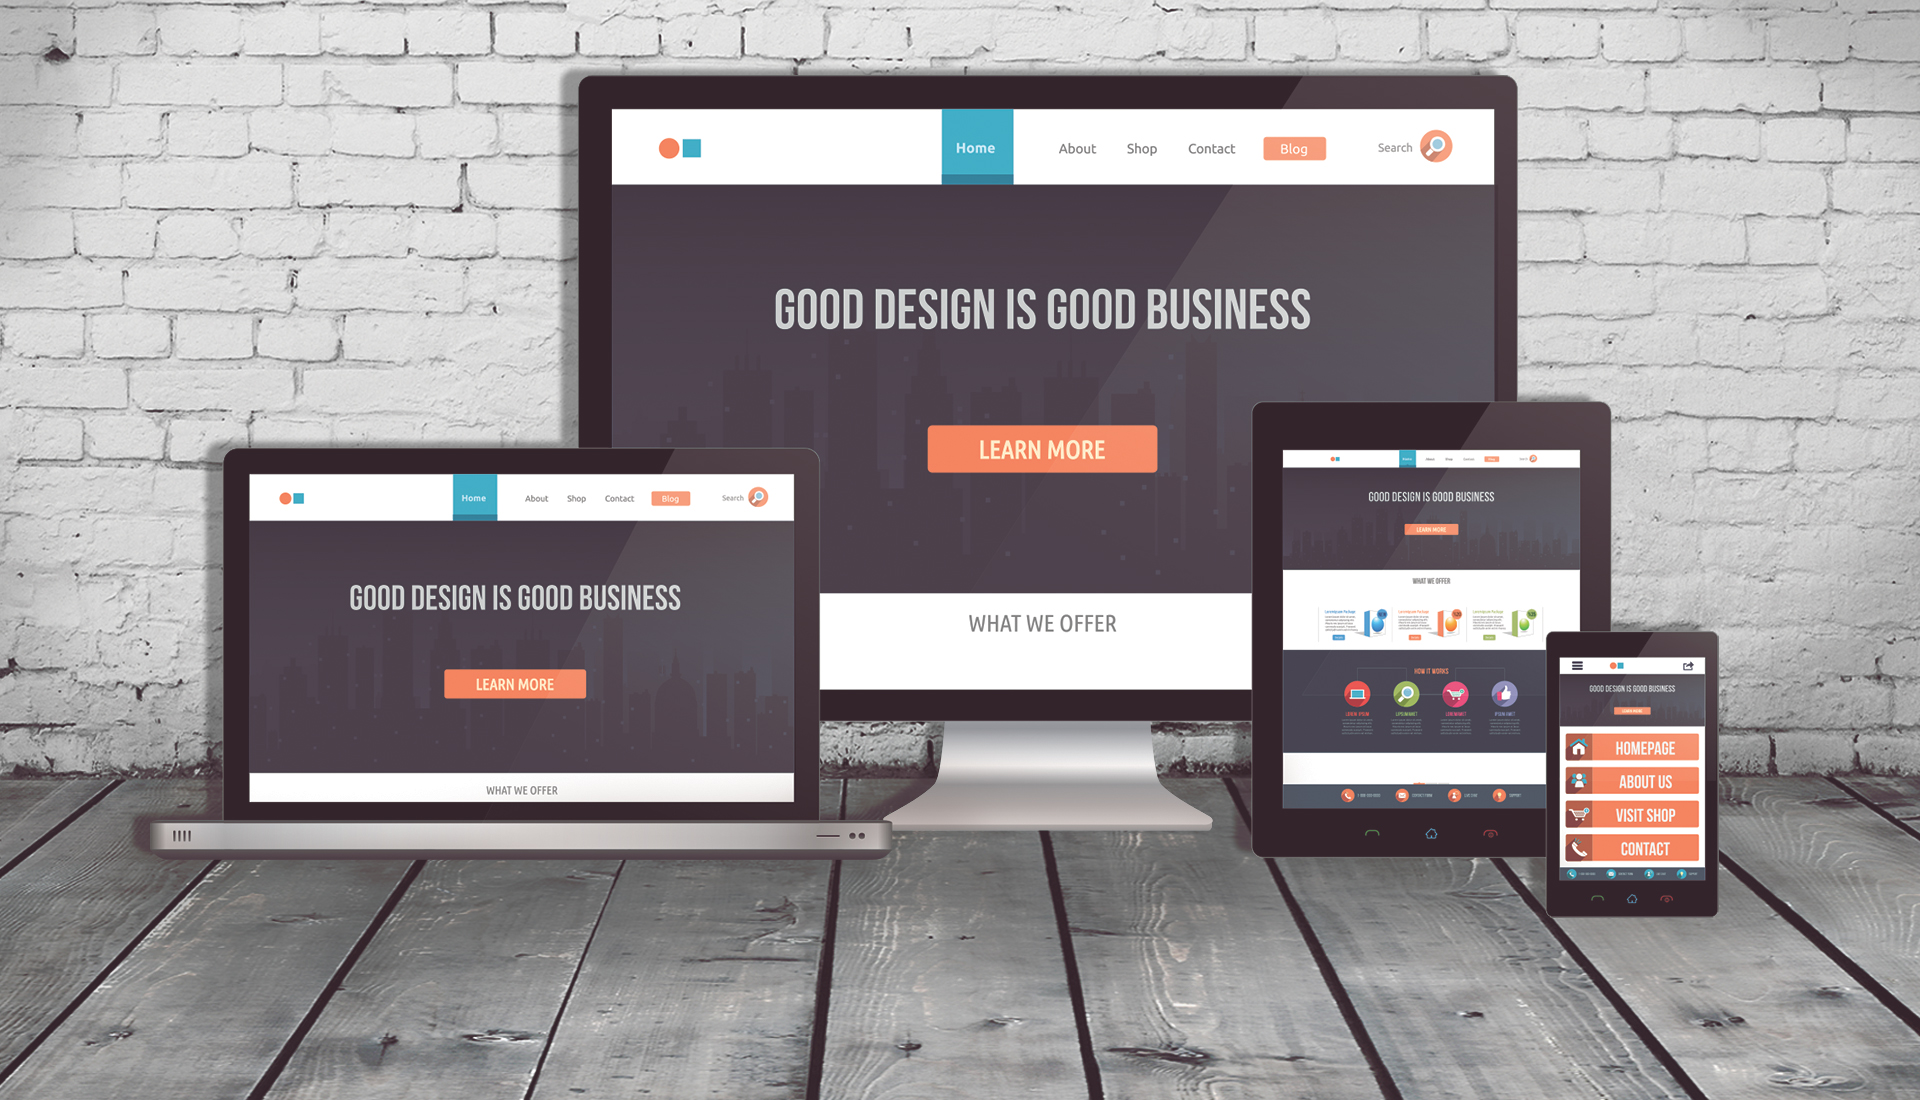 GoodDesign-1